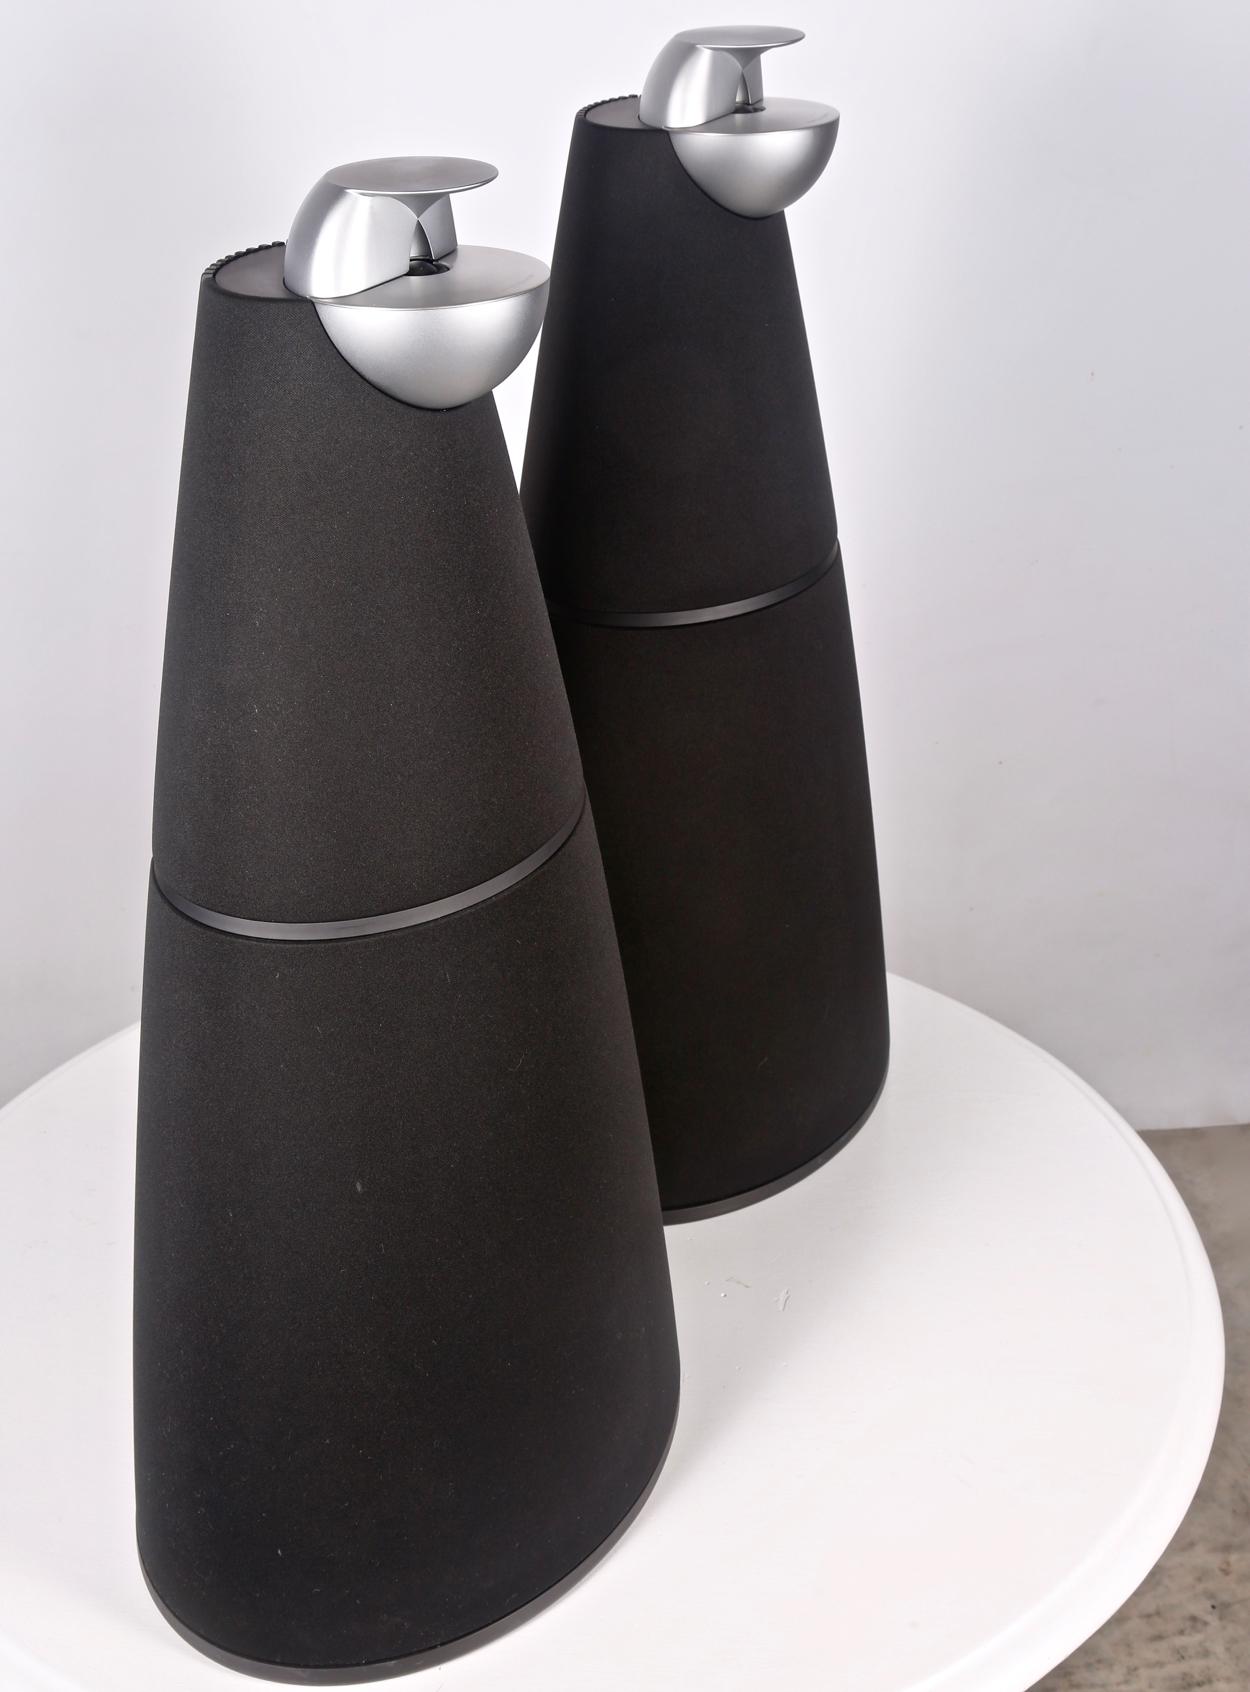 bang-olufsen-beolab-9-acoustic-lens